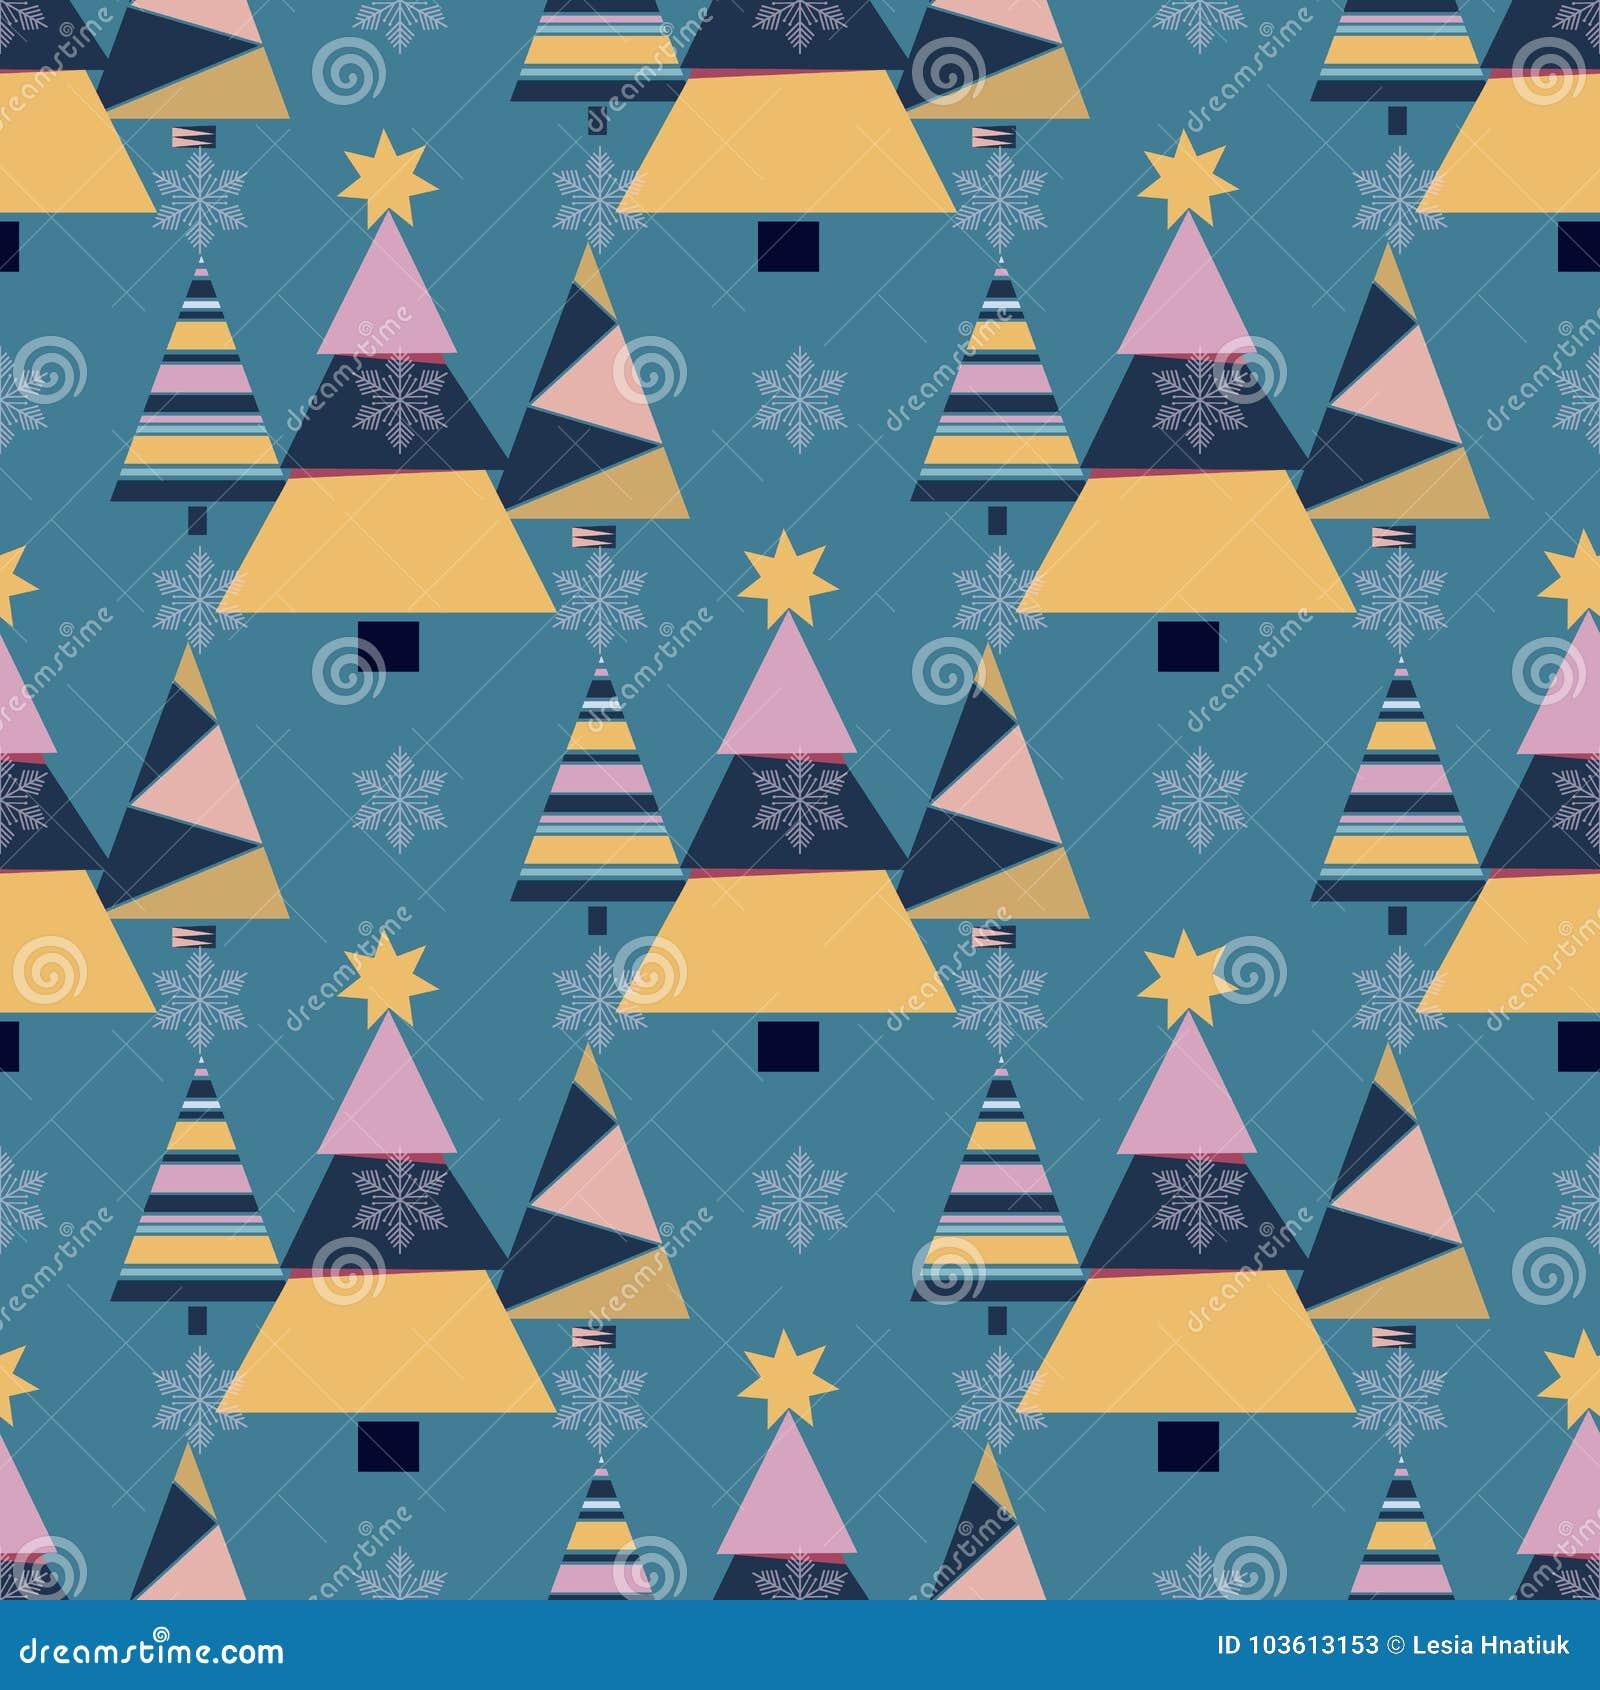 Snowflake winter christmas tree holiday fir-tree design season december snow star celebration ornament vector